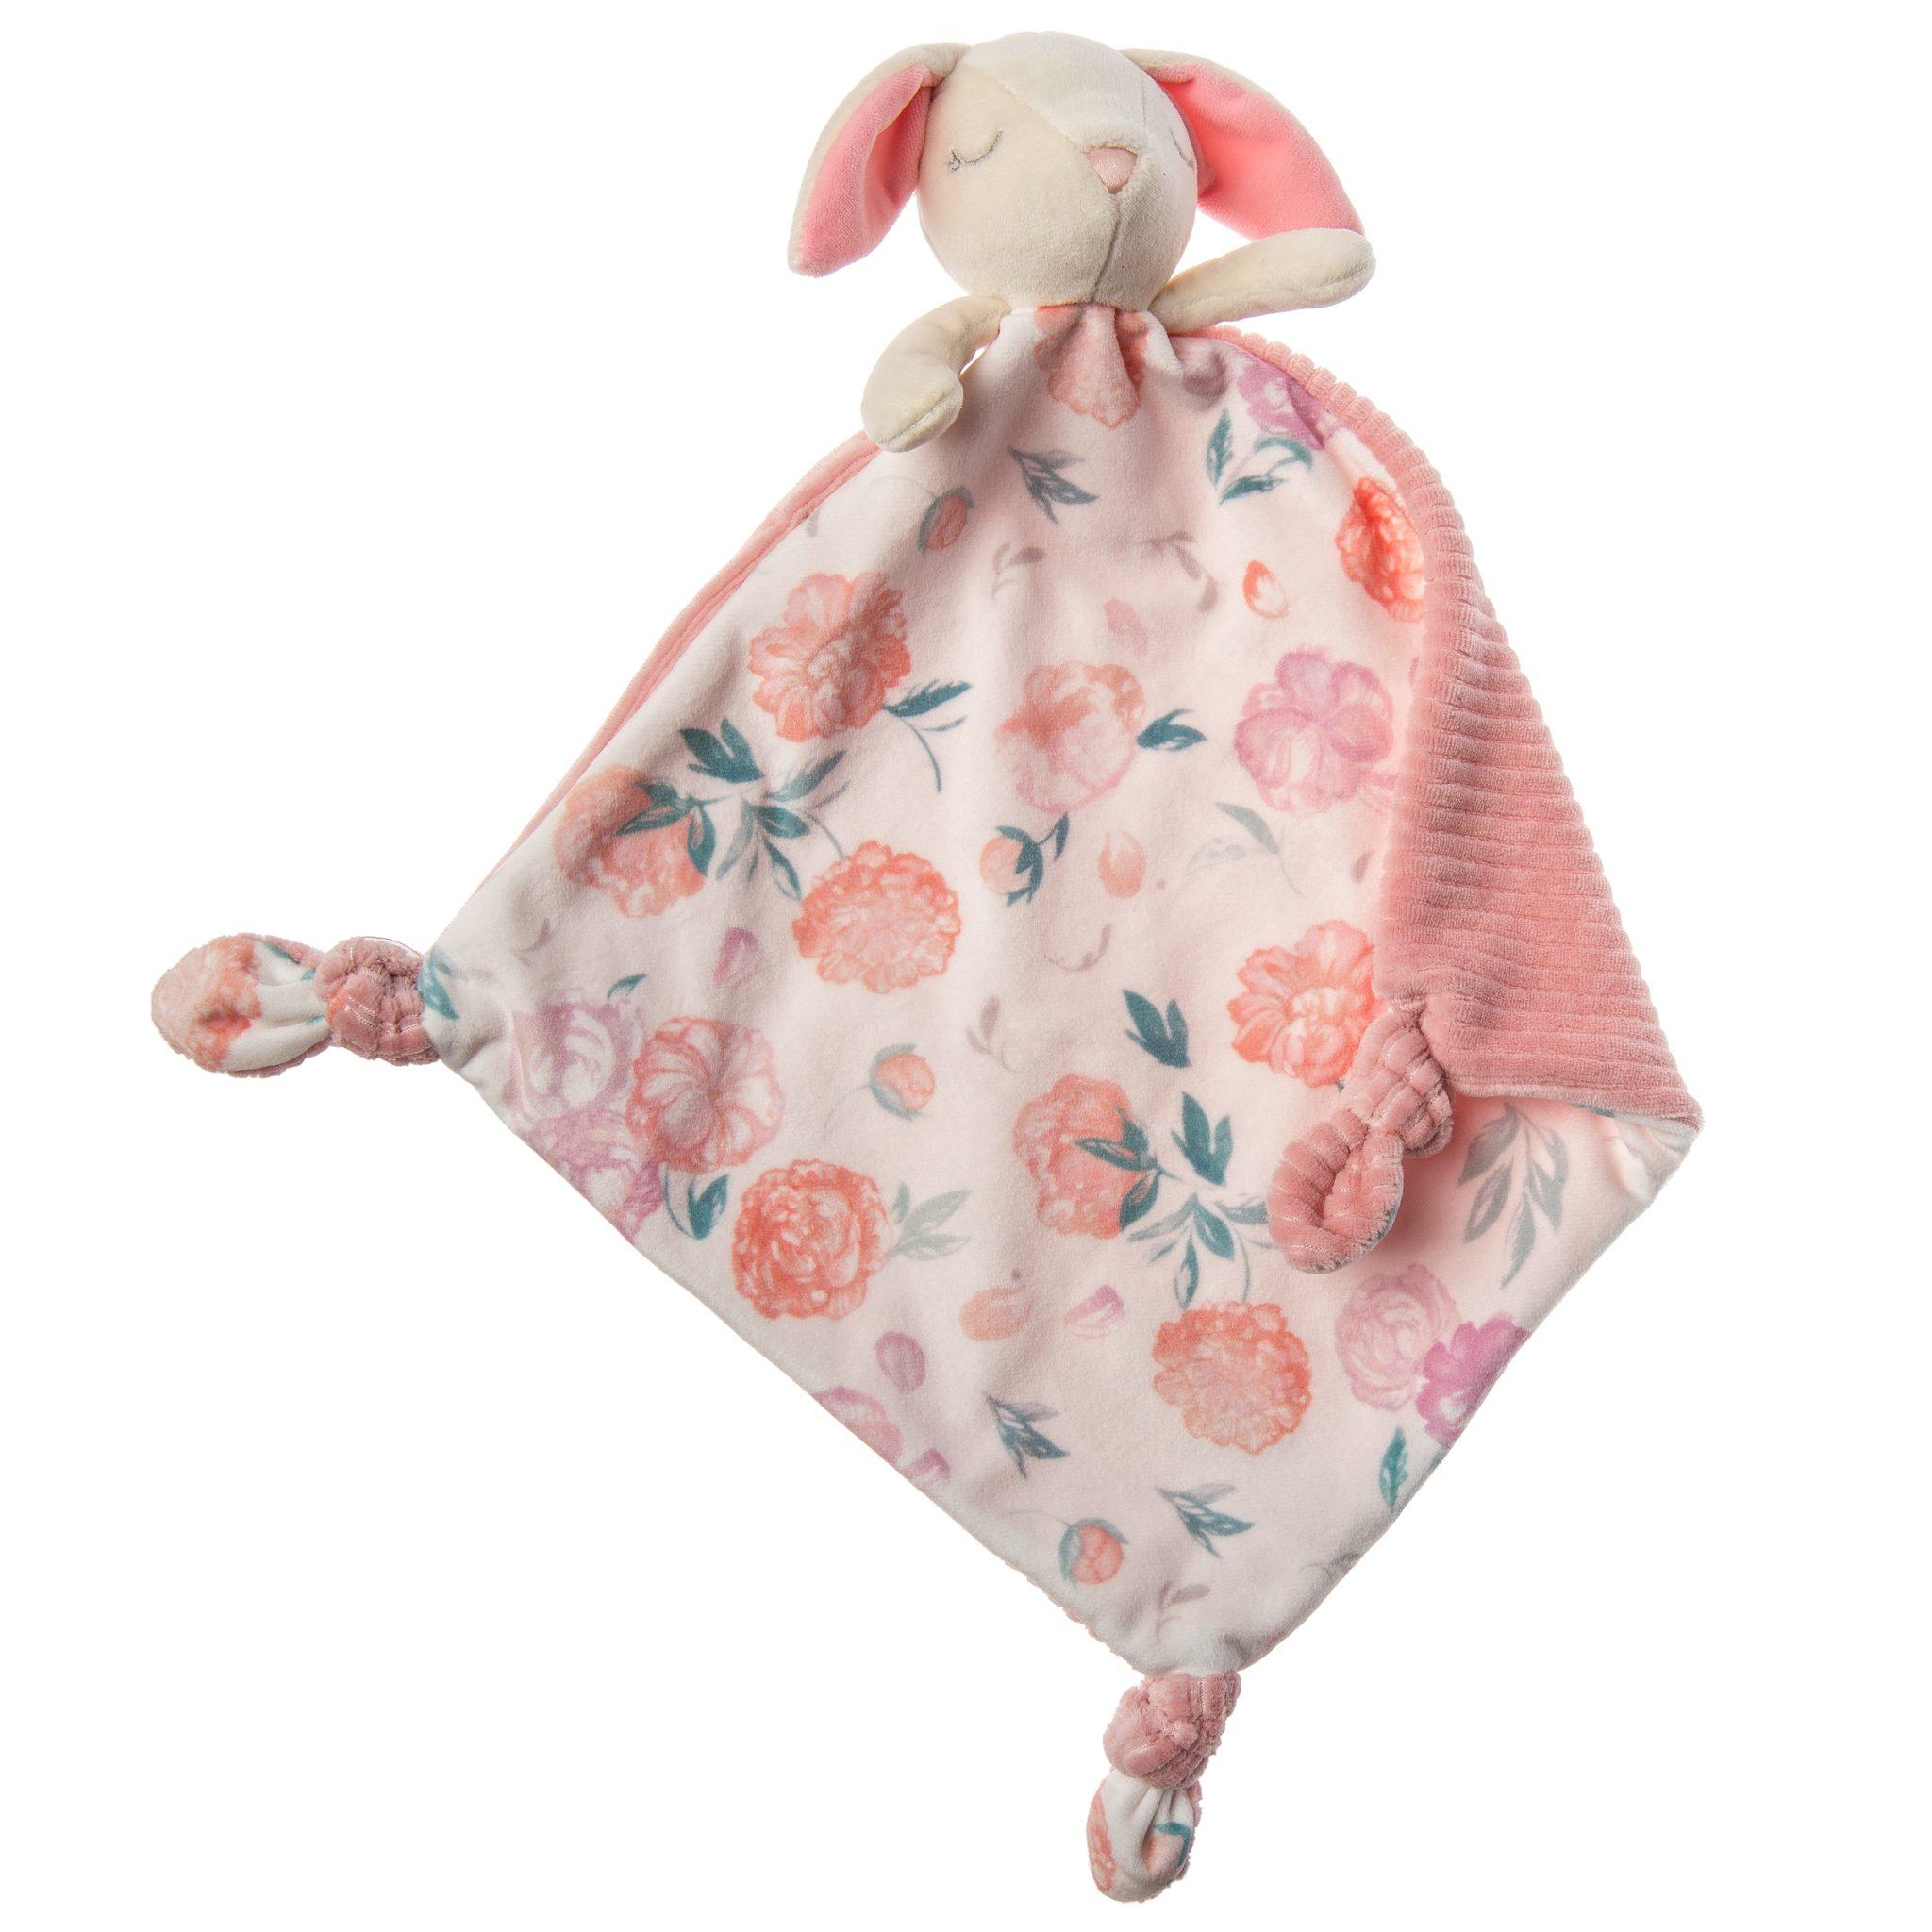 Down Under Koala 10 x 10-Inches Mary Meyer Little Knottie Lovey Security Blanket